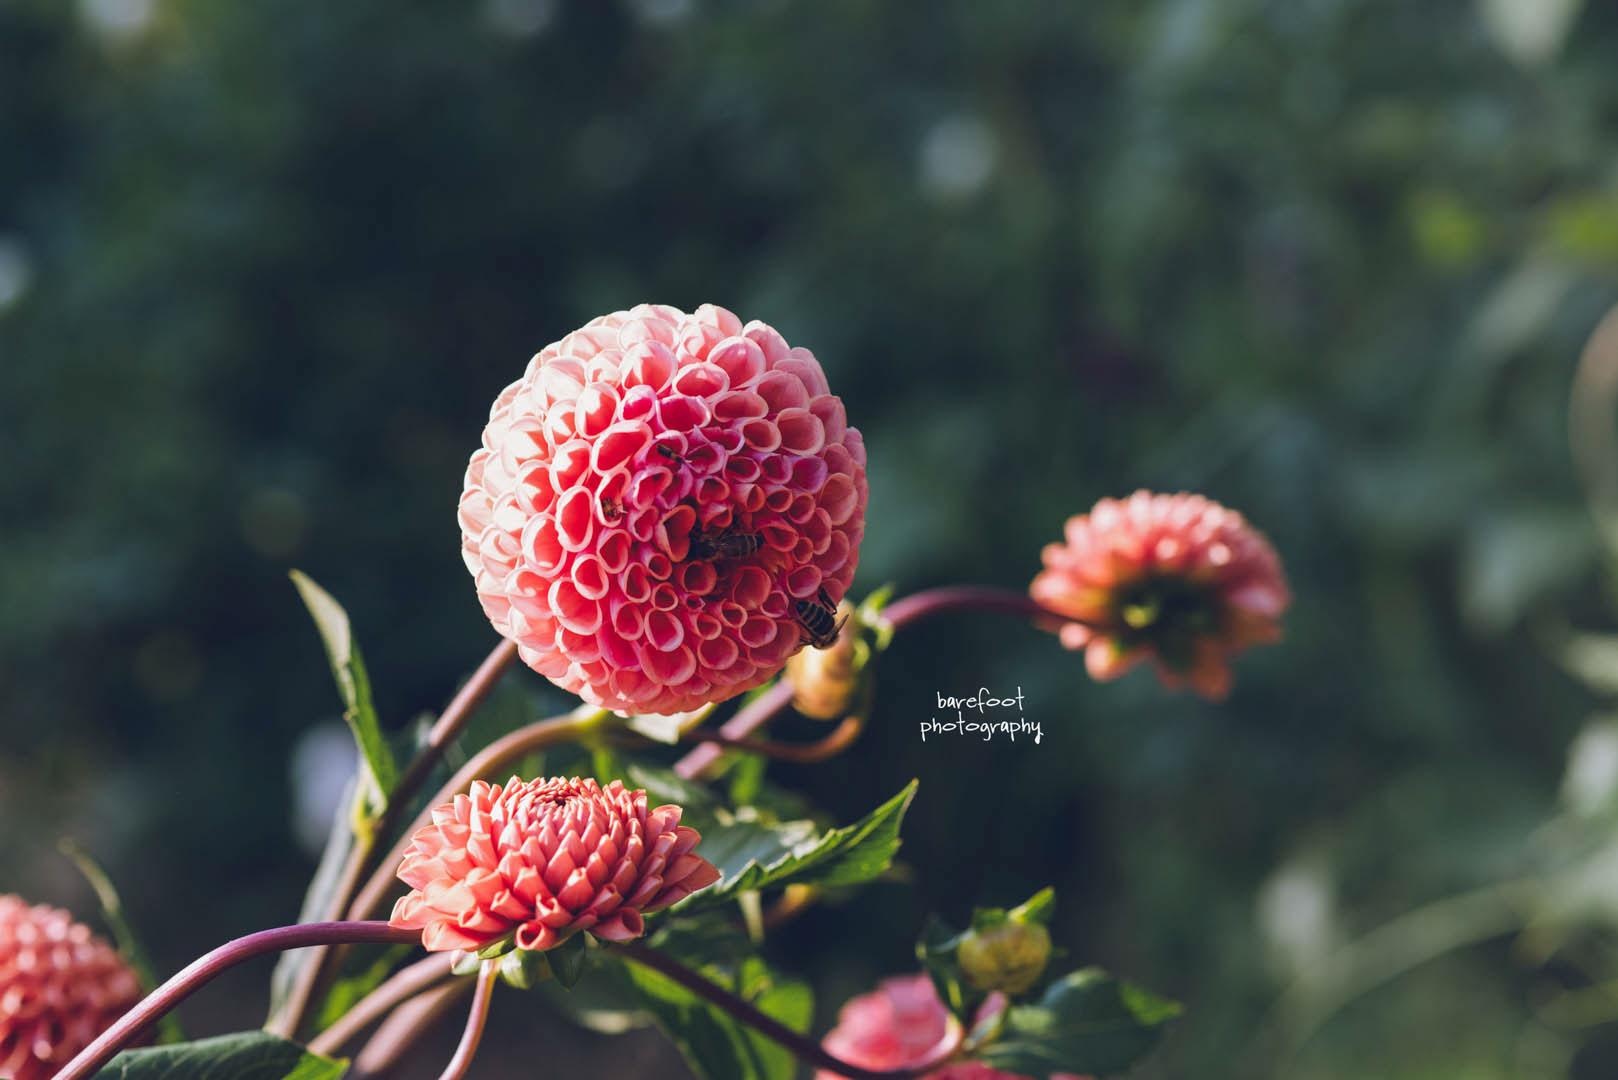 flowerandsoul-04